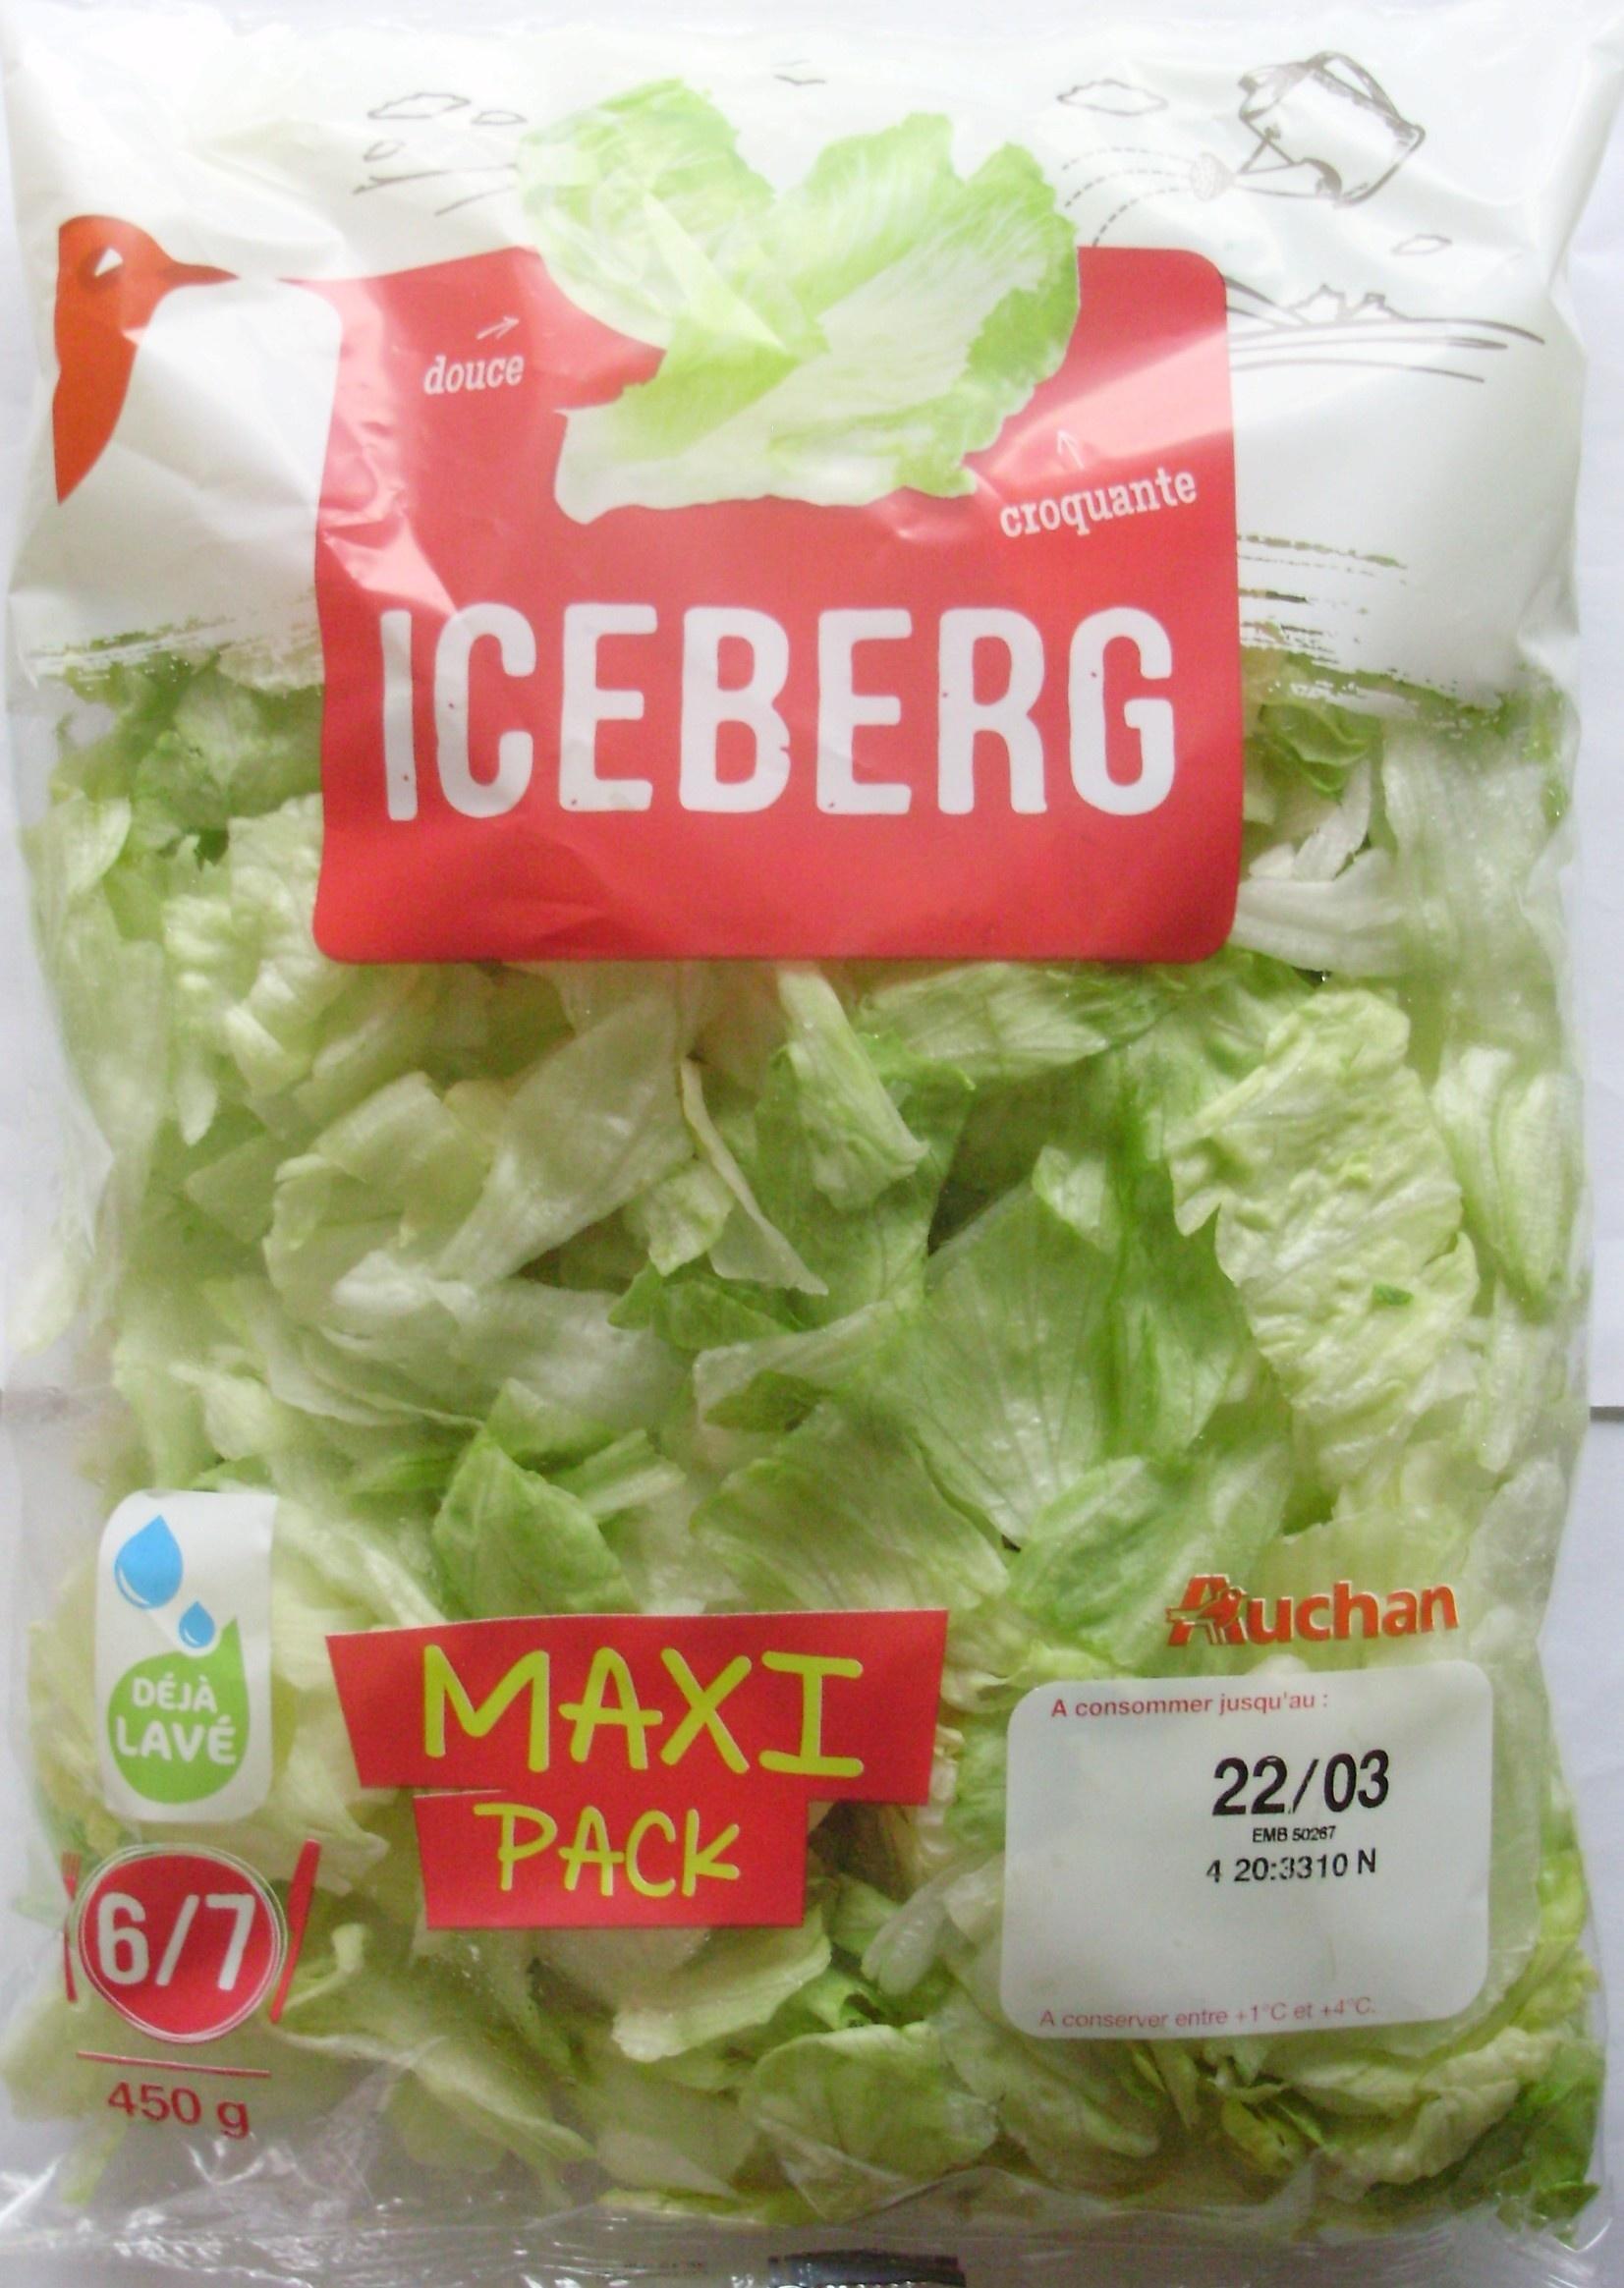 Iceberg, Maxi Pack (6/7 portions) - Produit